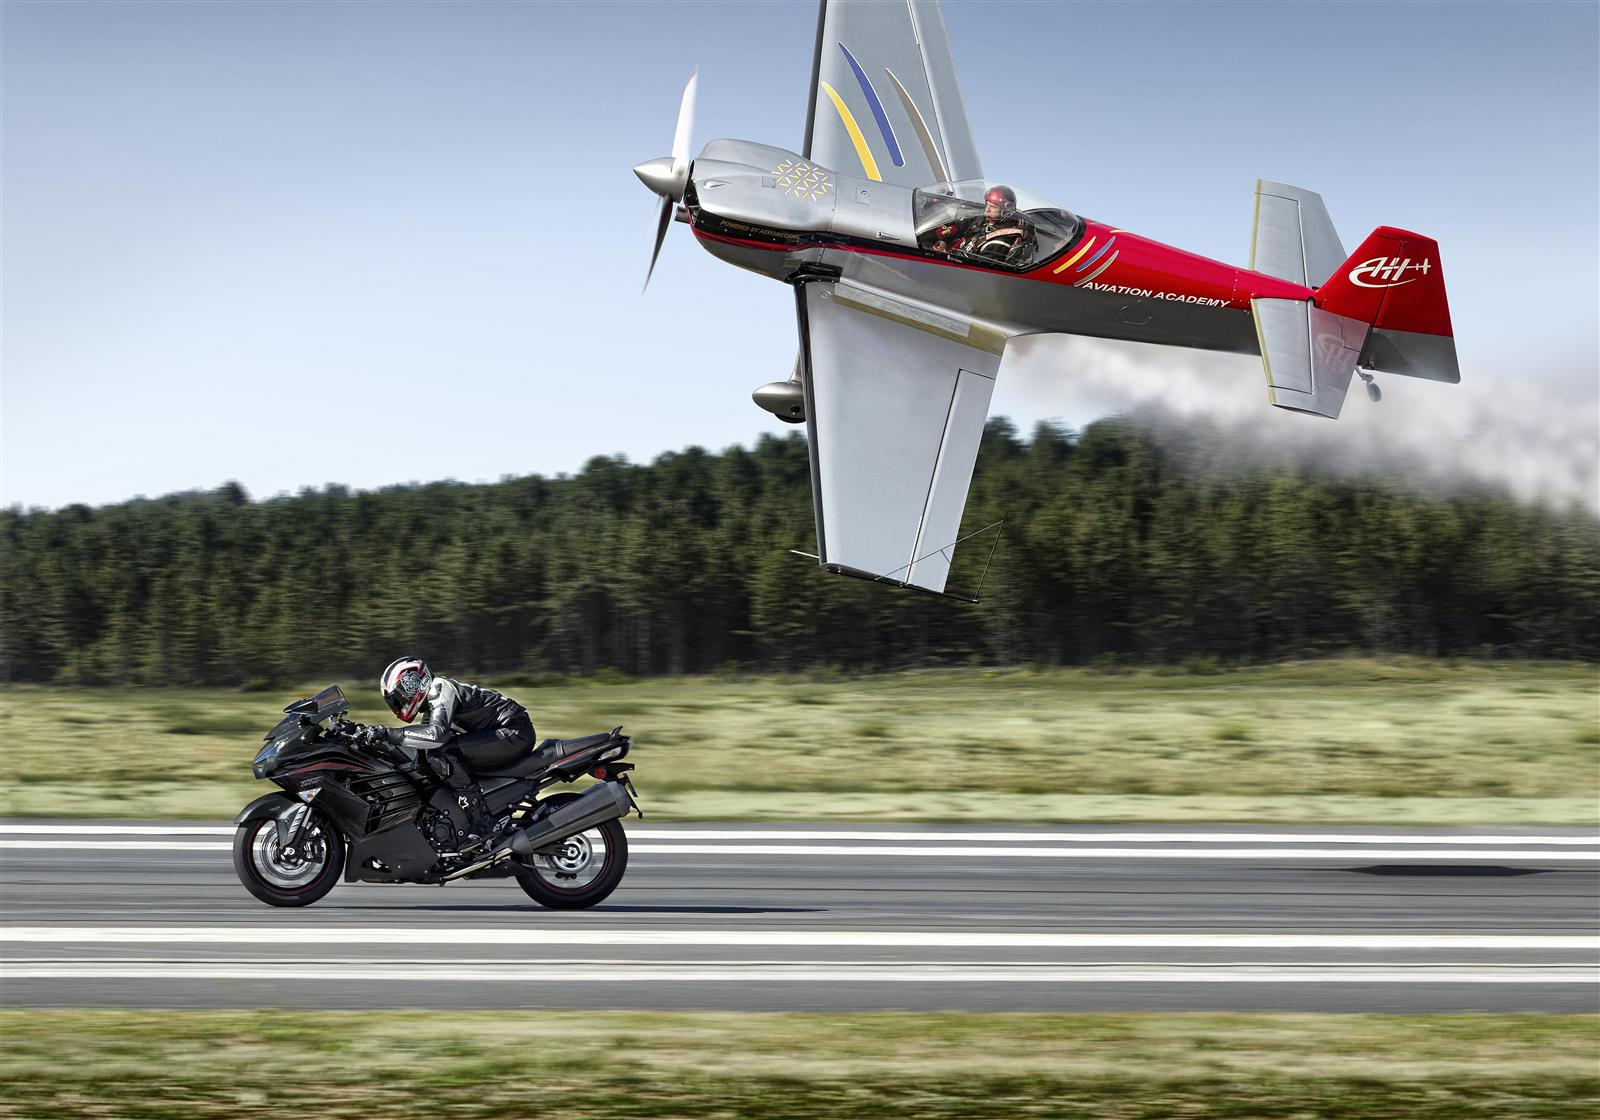 Kawasaki ZZR1400 szybszy niż samolot